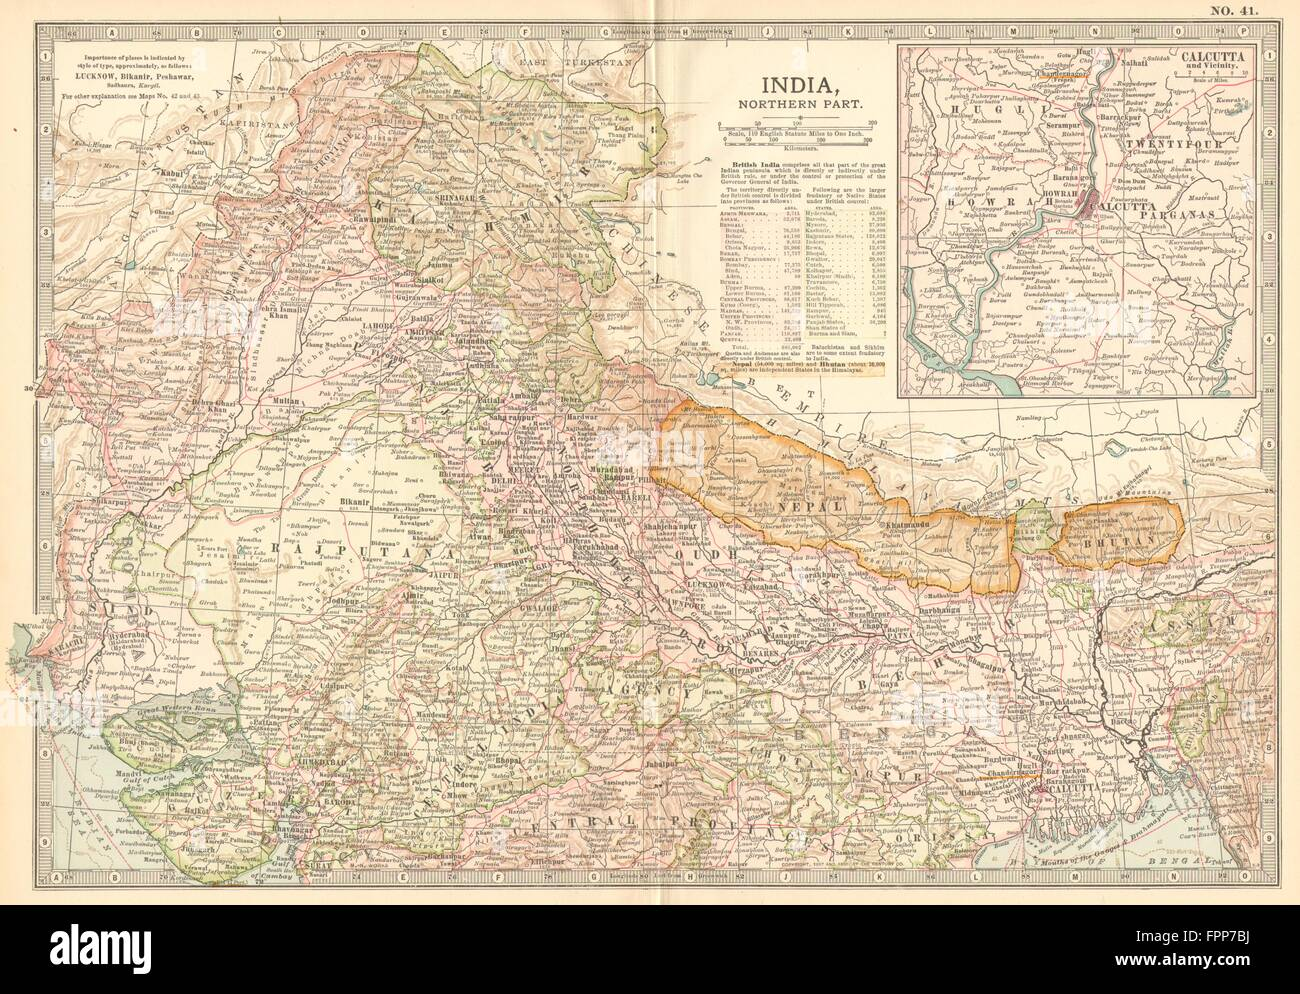 INDIA NORTH NEPAL.Kashmir Rajputana Punjab Calcutta.w// battlefields 1903 map